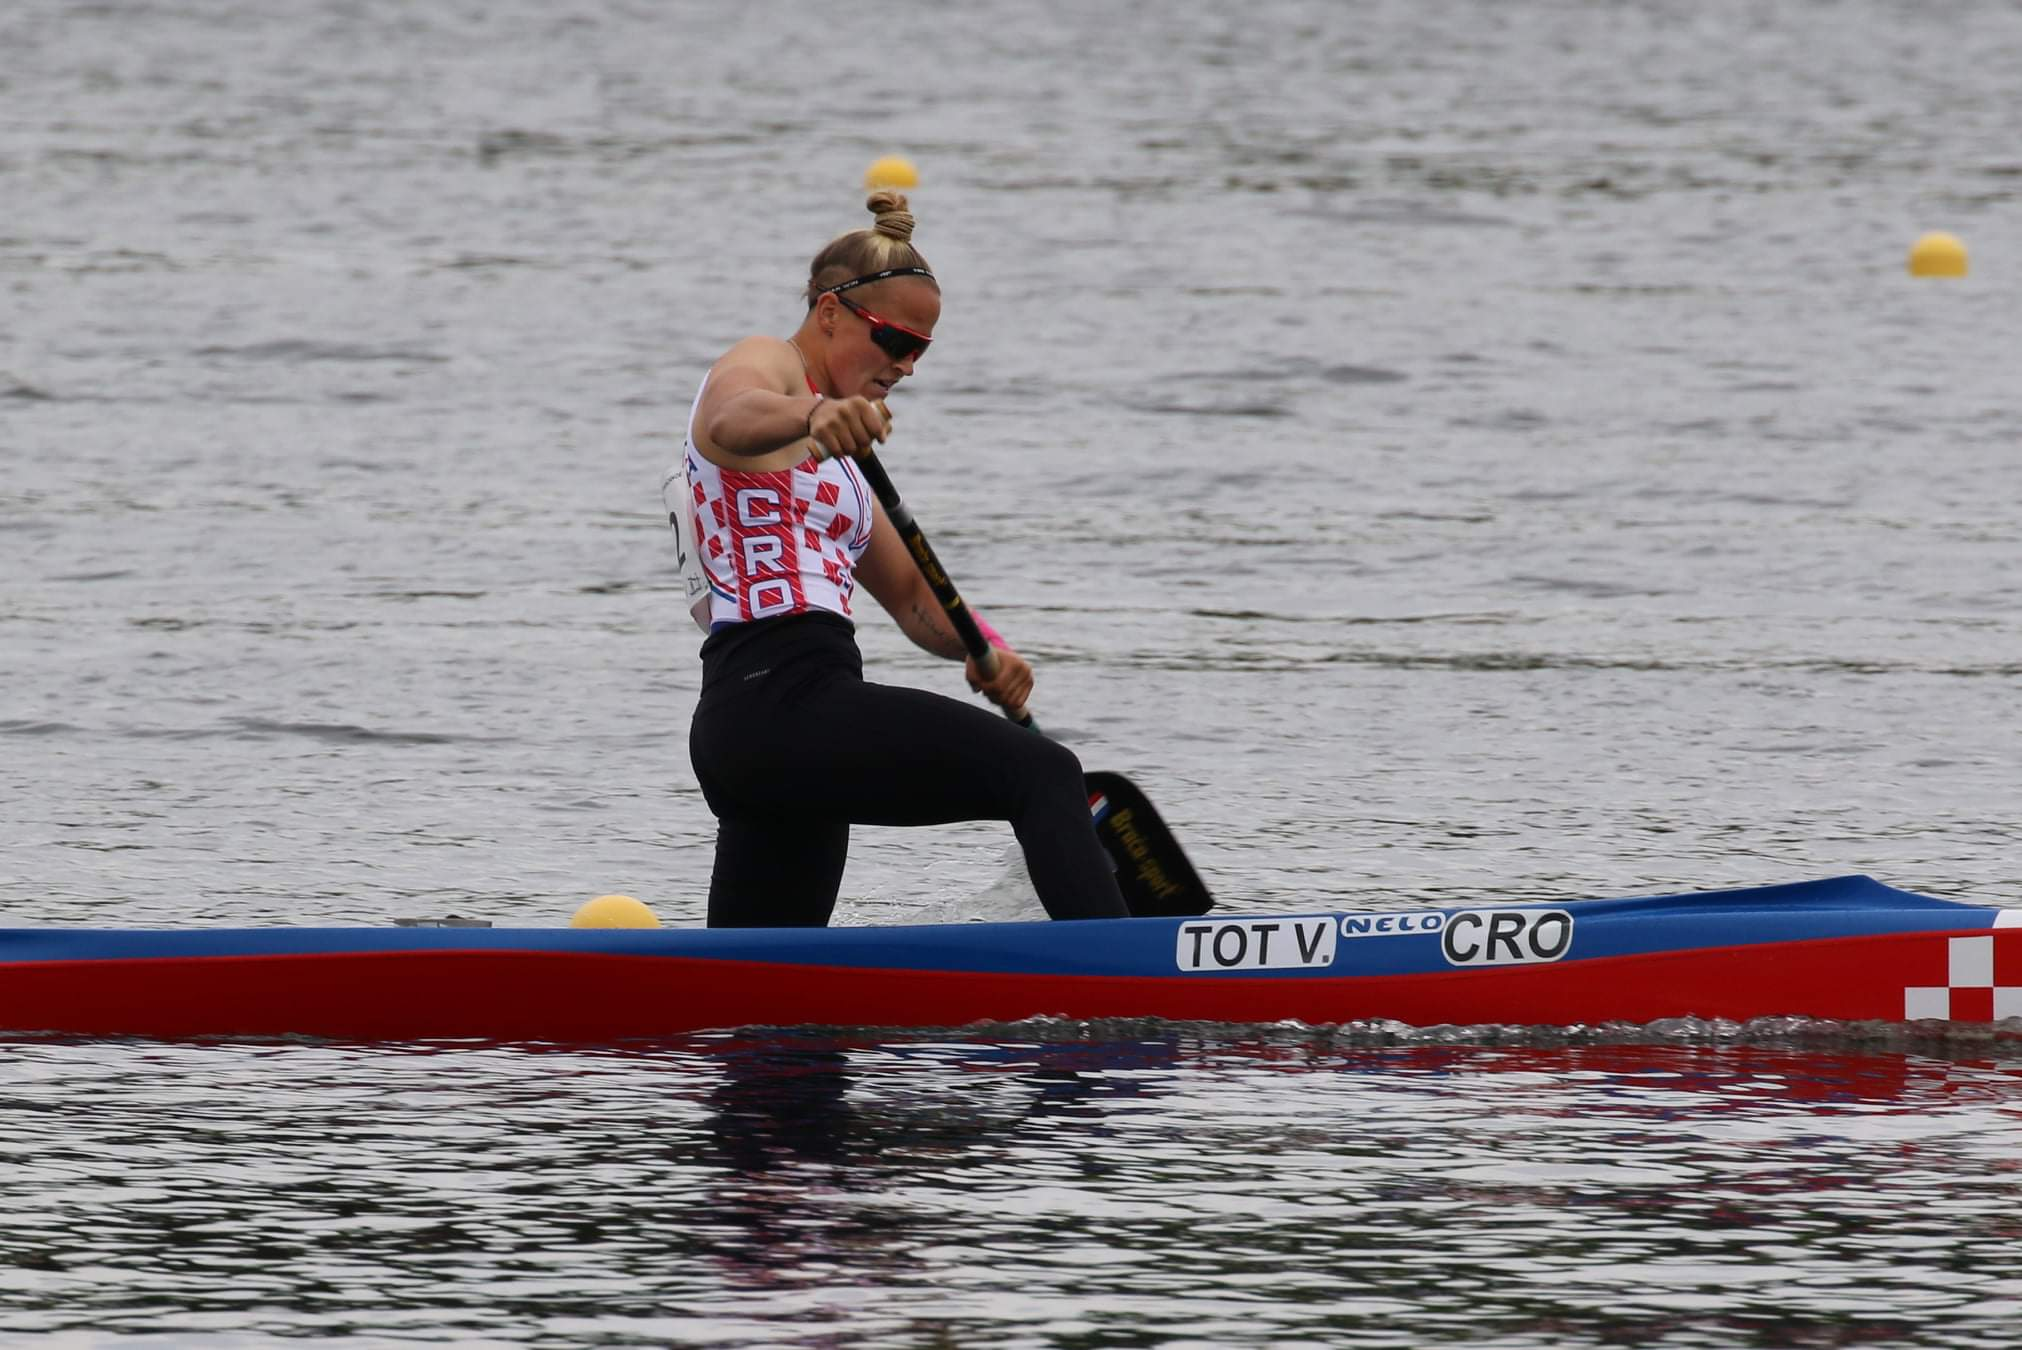 Vanesa Tot potvrdila dobru formu, sjajne rezultate zabilježila je u Poznanu